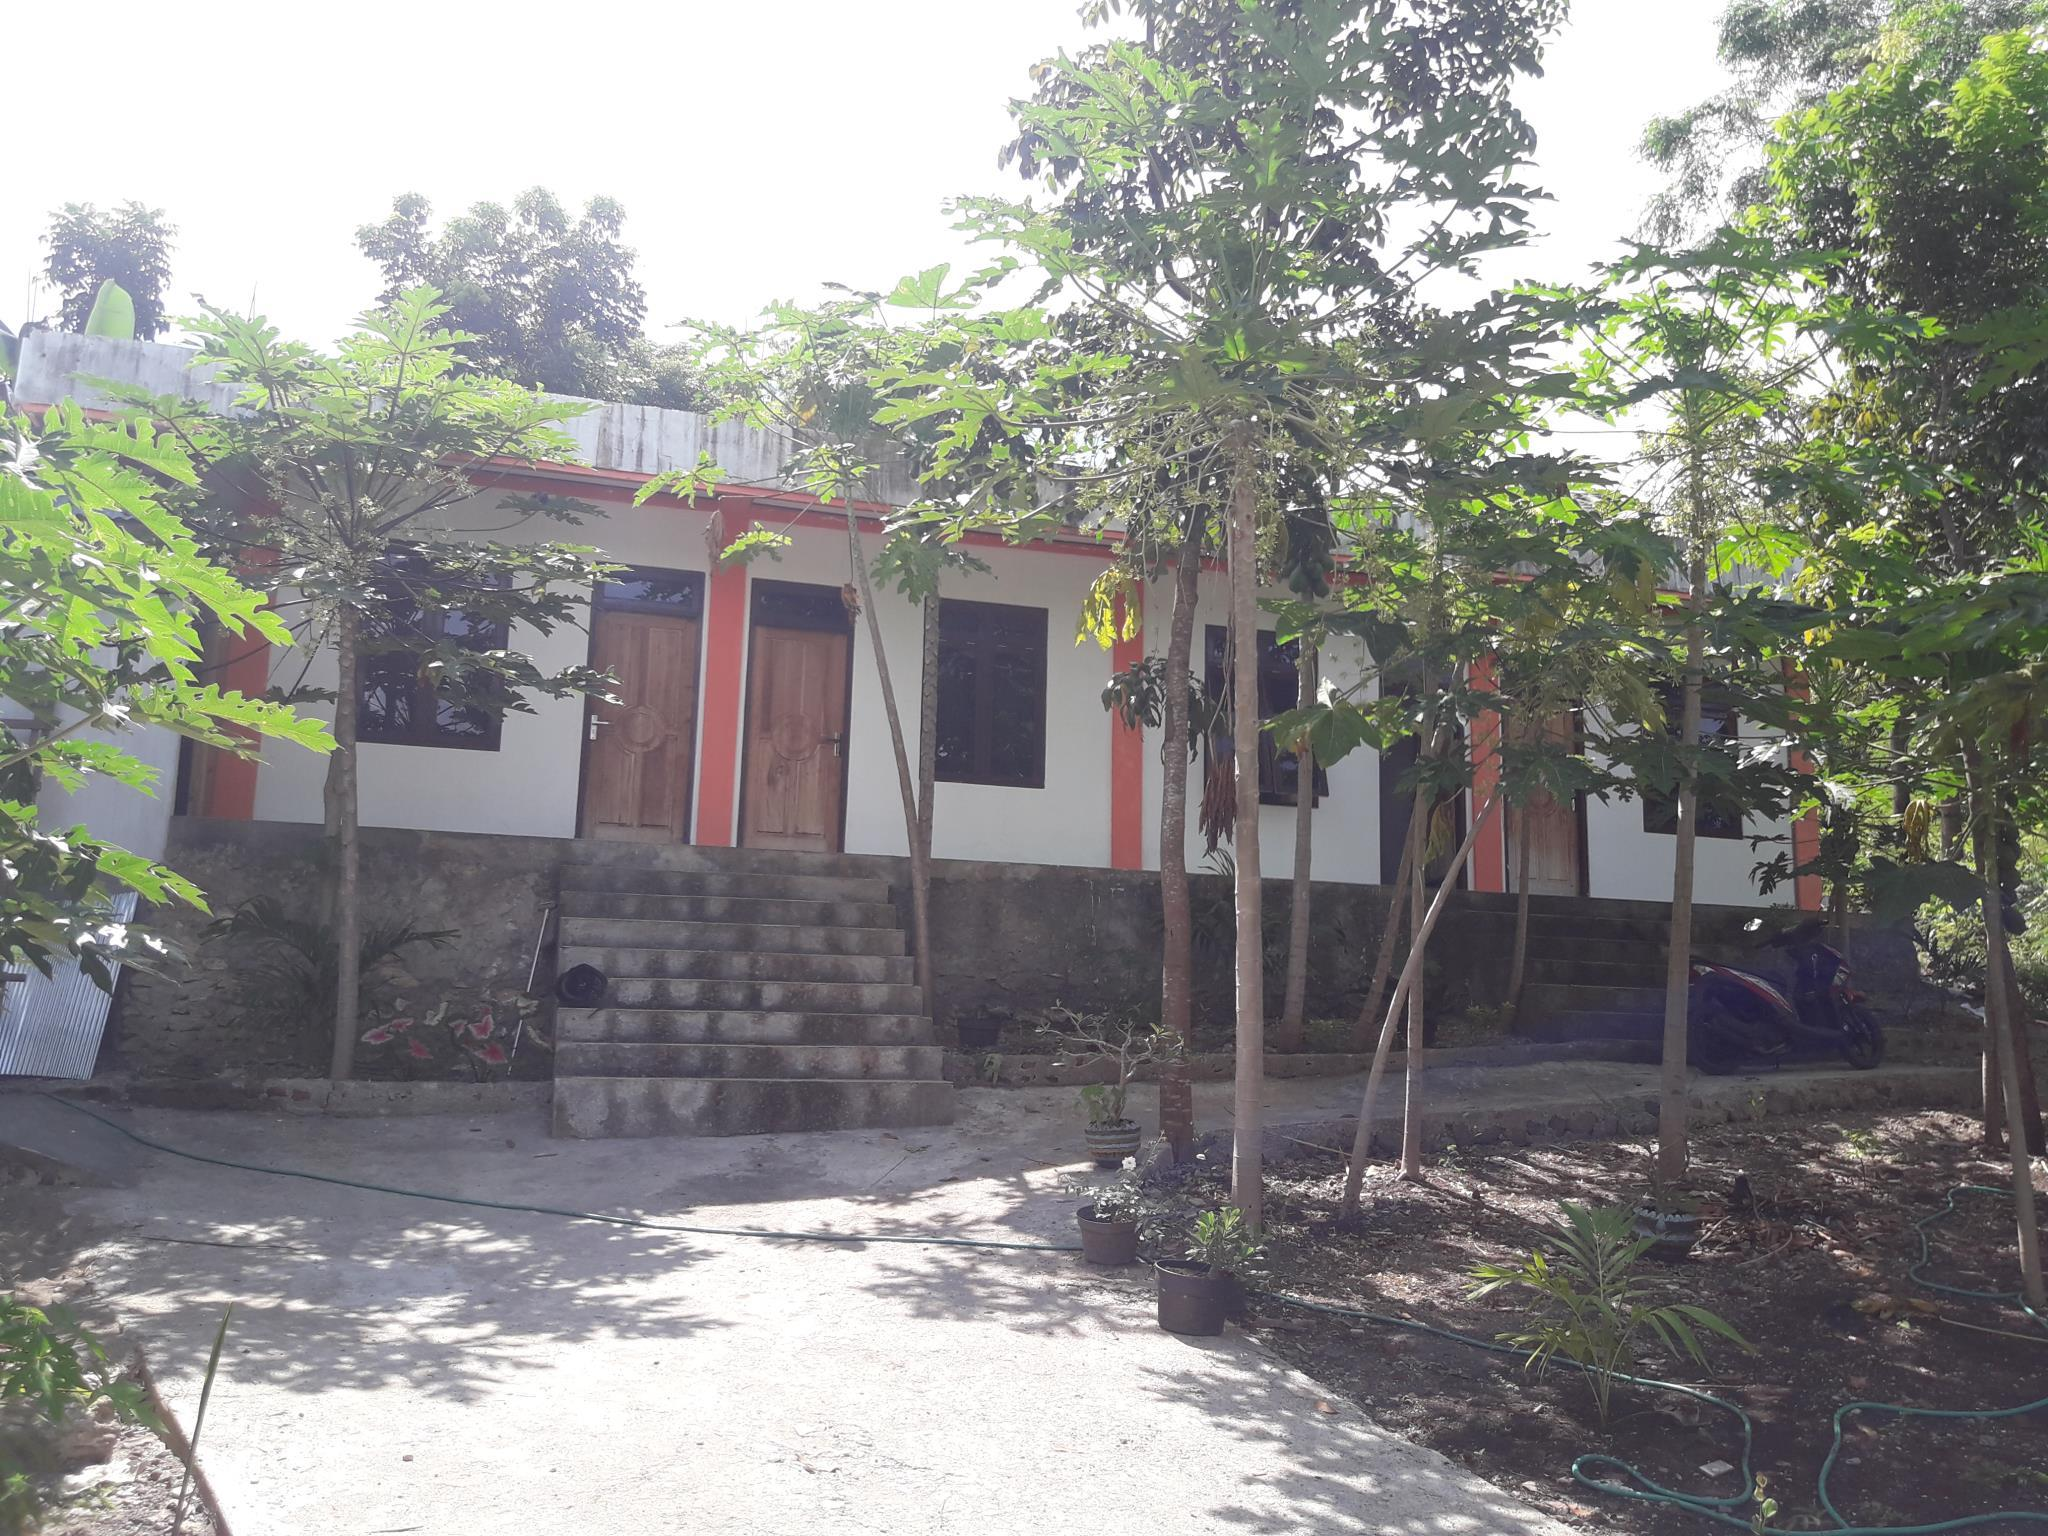 The Teuz Hotel